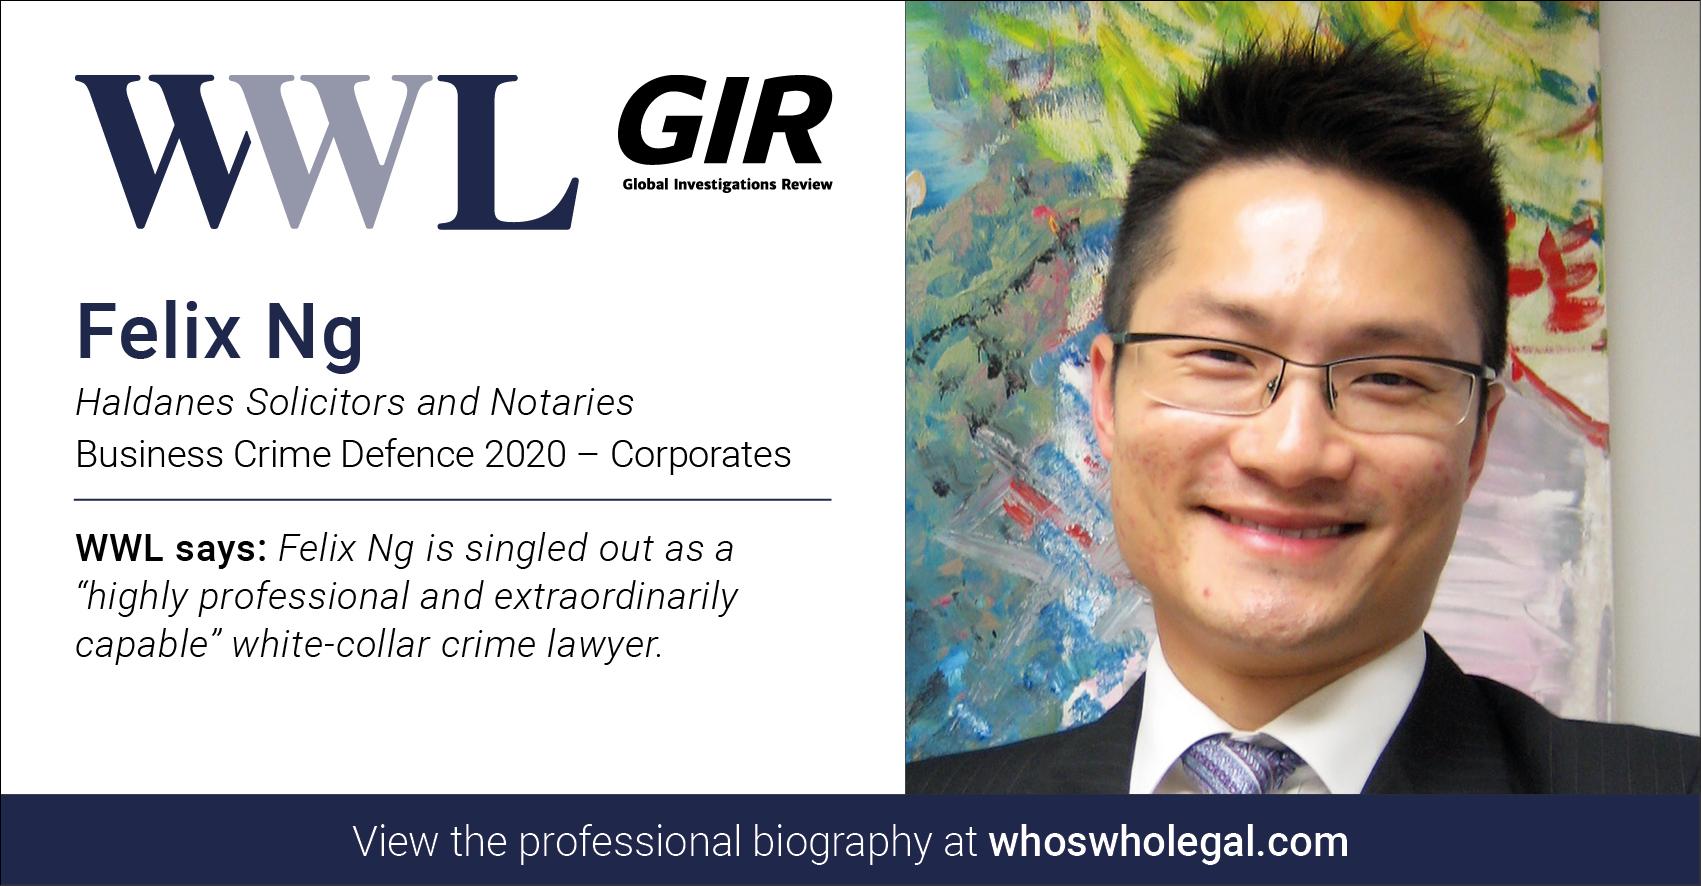 Felix Ng Social Media Card Coporate - Haldanes recognised in Who's Who Legal Business Crime Defence 2020